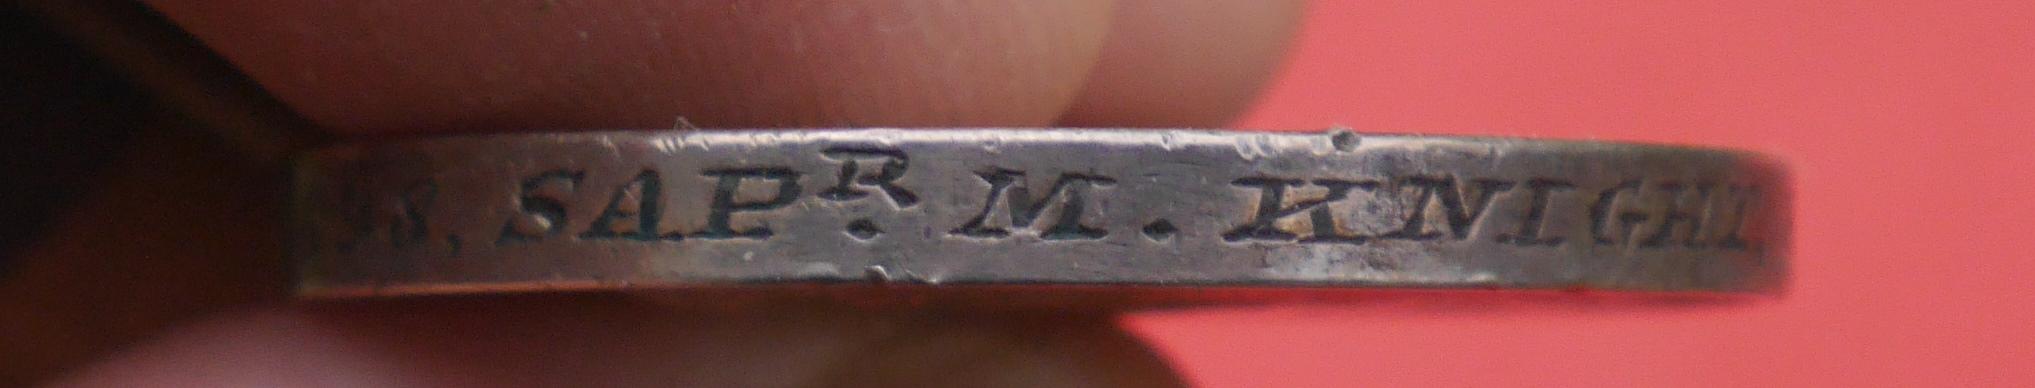 Medal Nile name 2 compressed.jpg